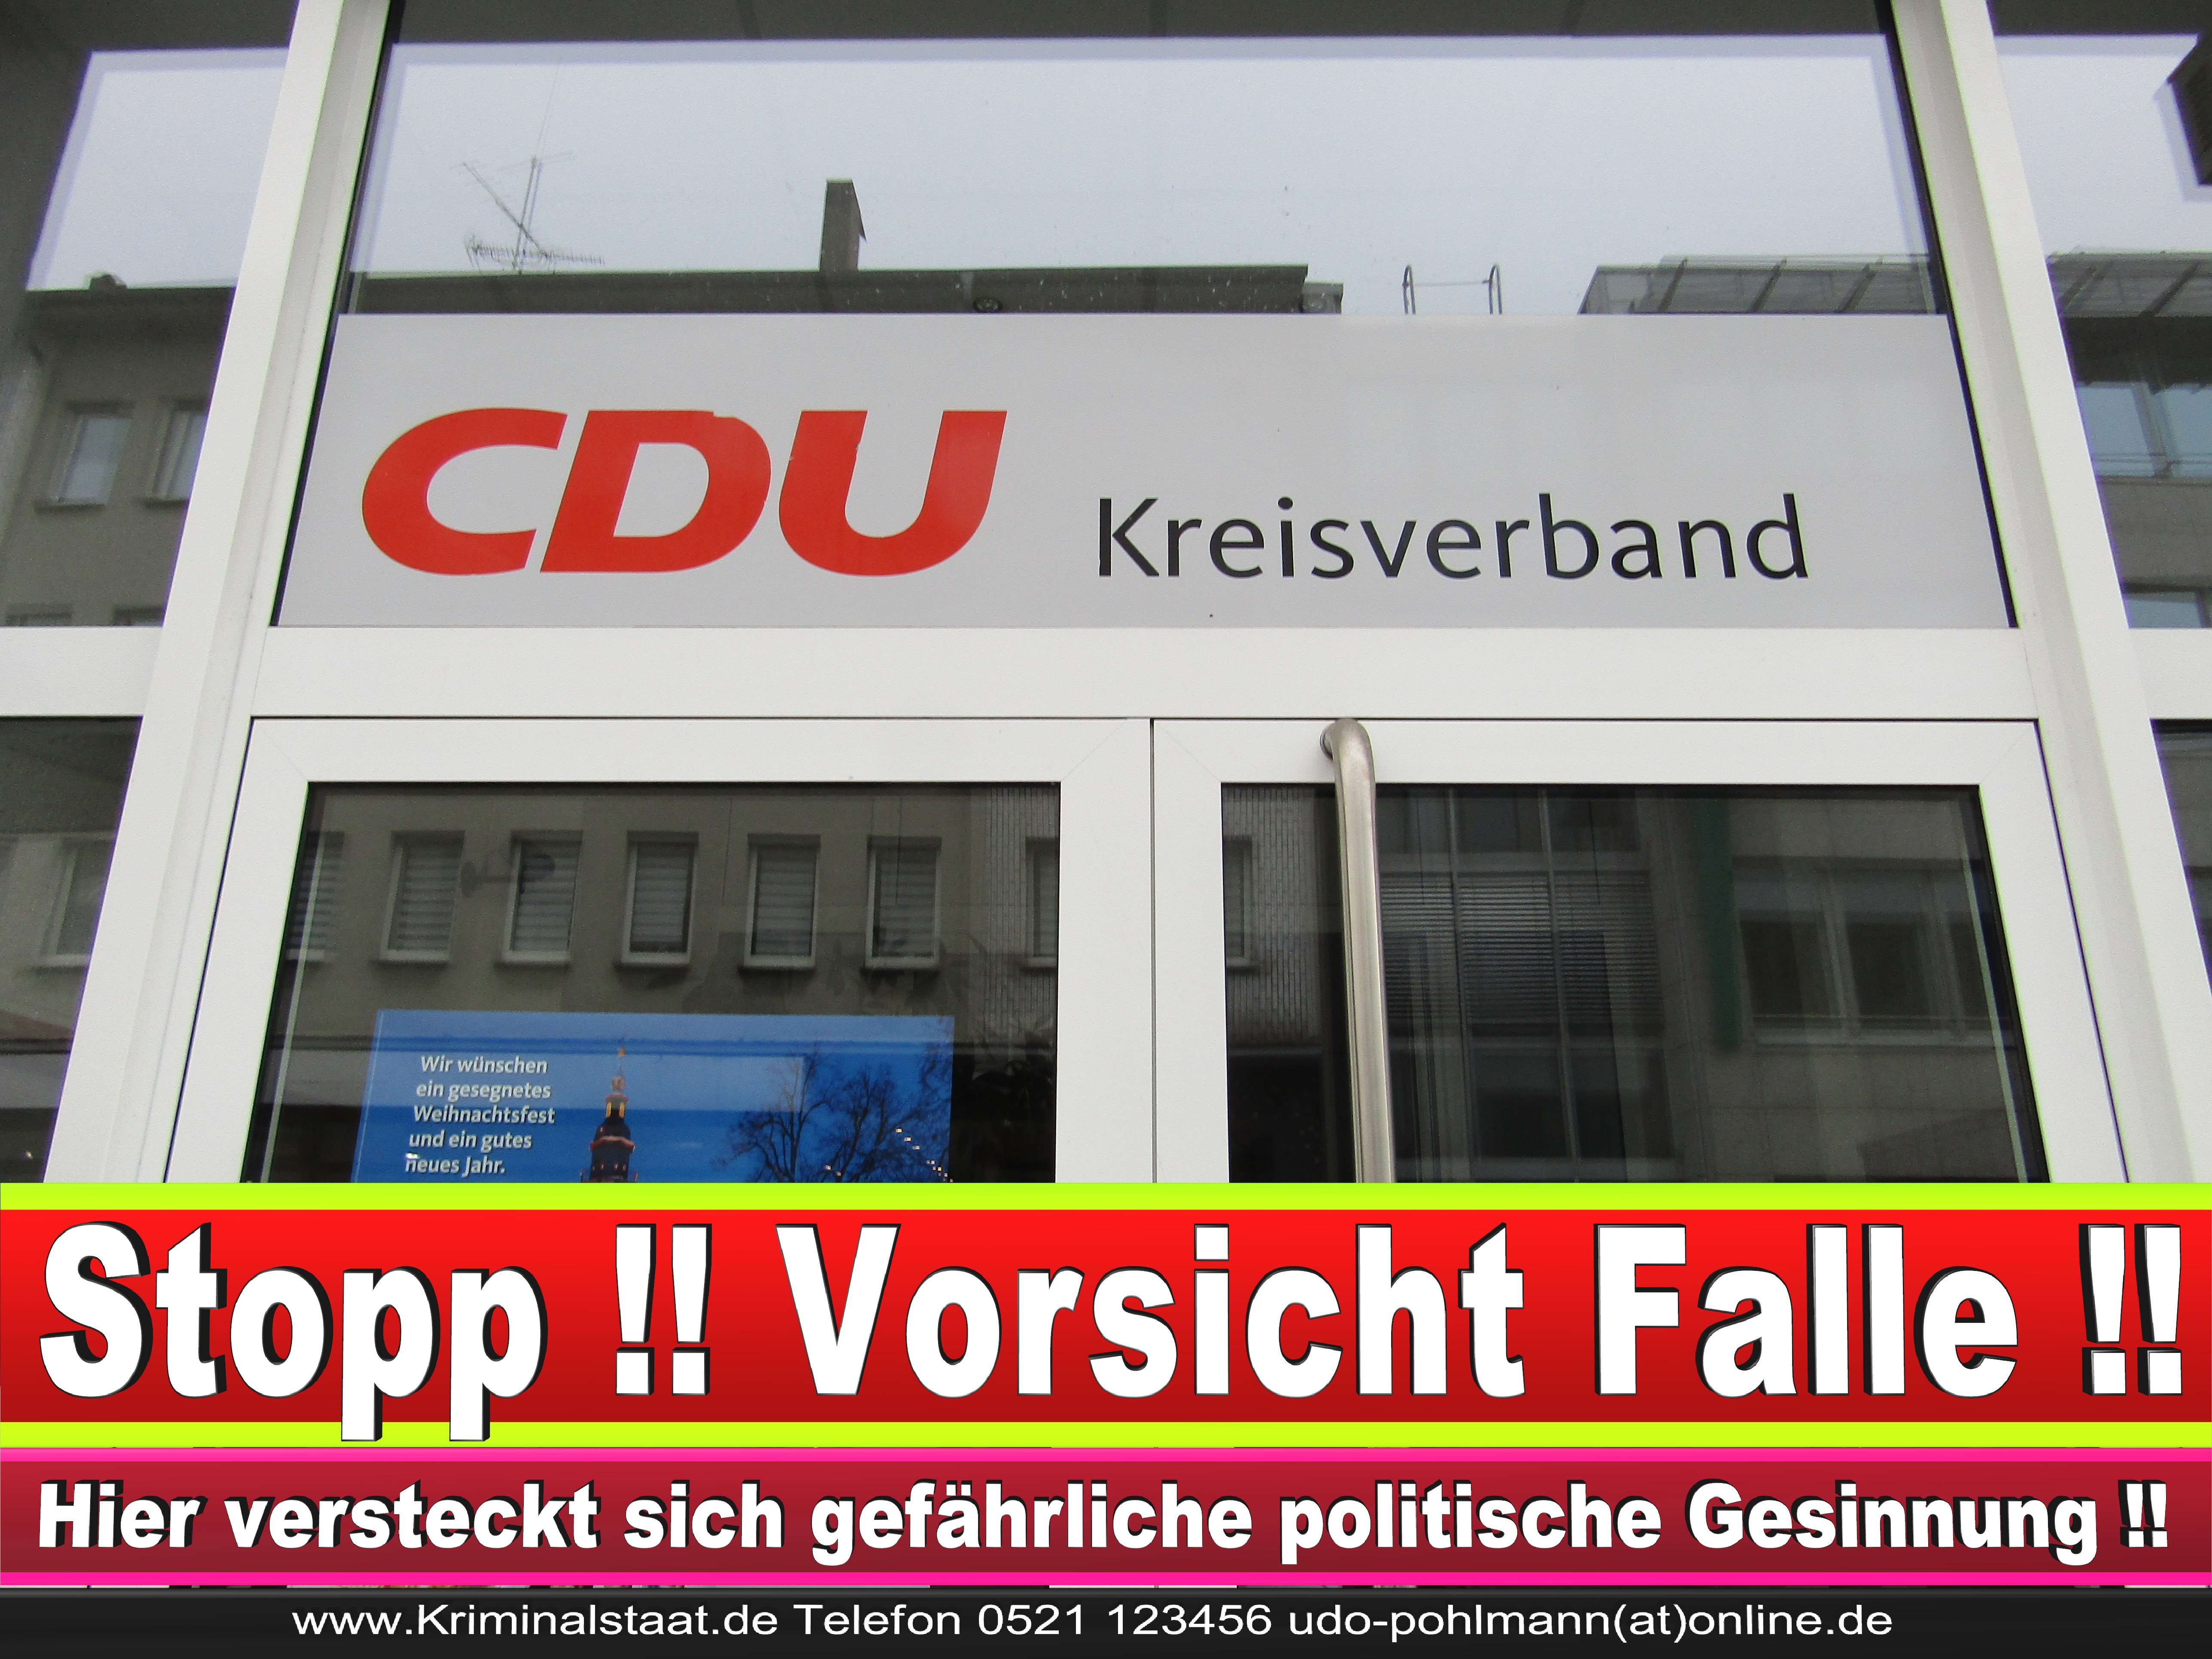 CDU DORTMUND KREISVERBAND BüRGERBüRO CDU FRAKTION ORTSVERBAND CDU NRW GESCHäFTSSTELLE ADRESSE RATSMITGLIEDER CDU (9) 1